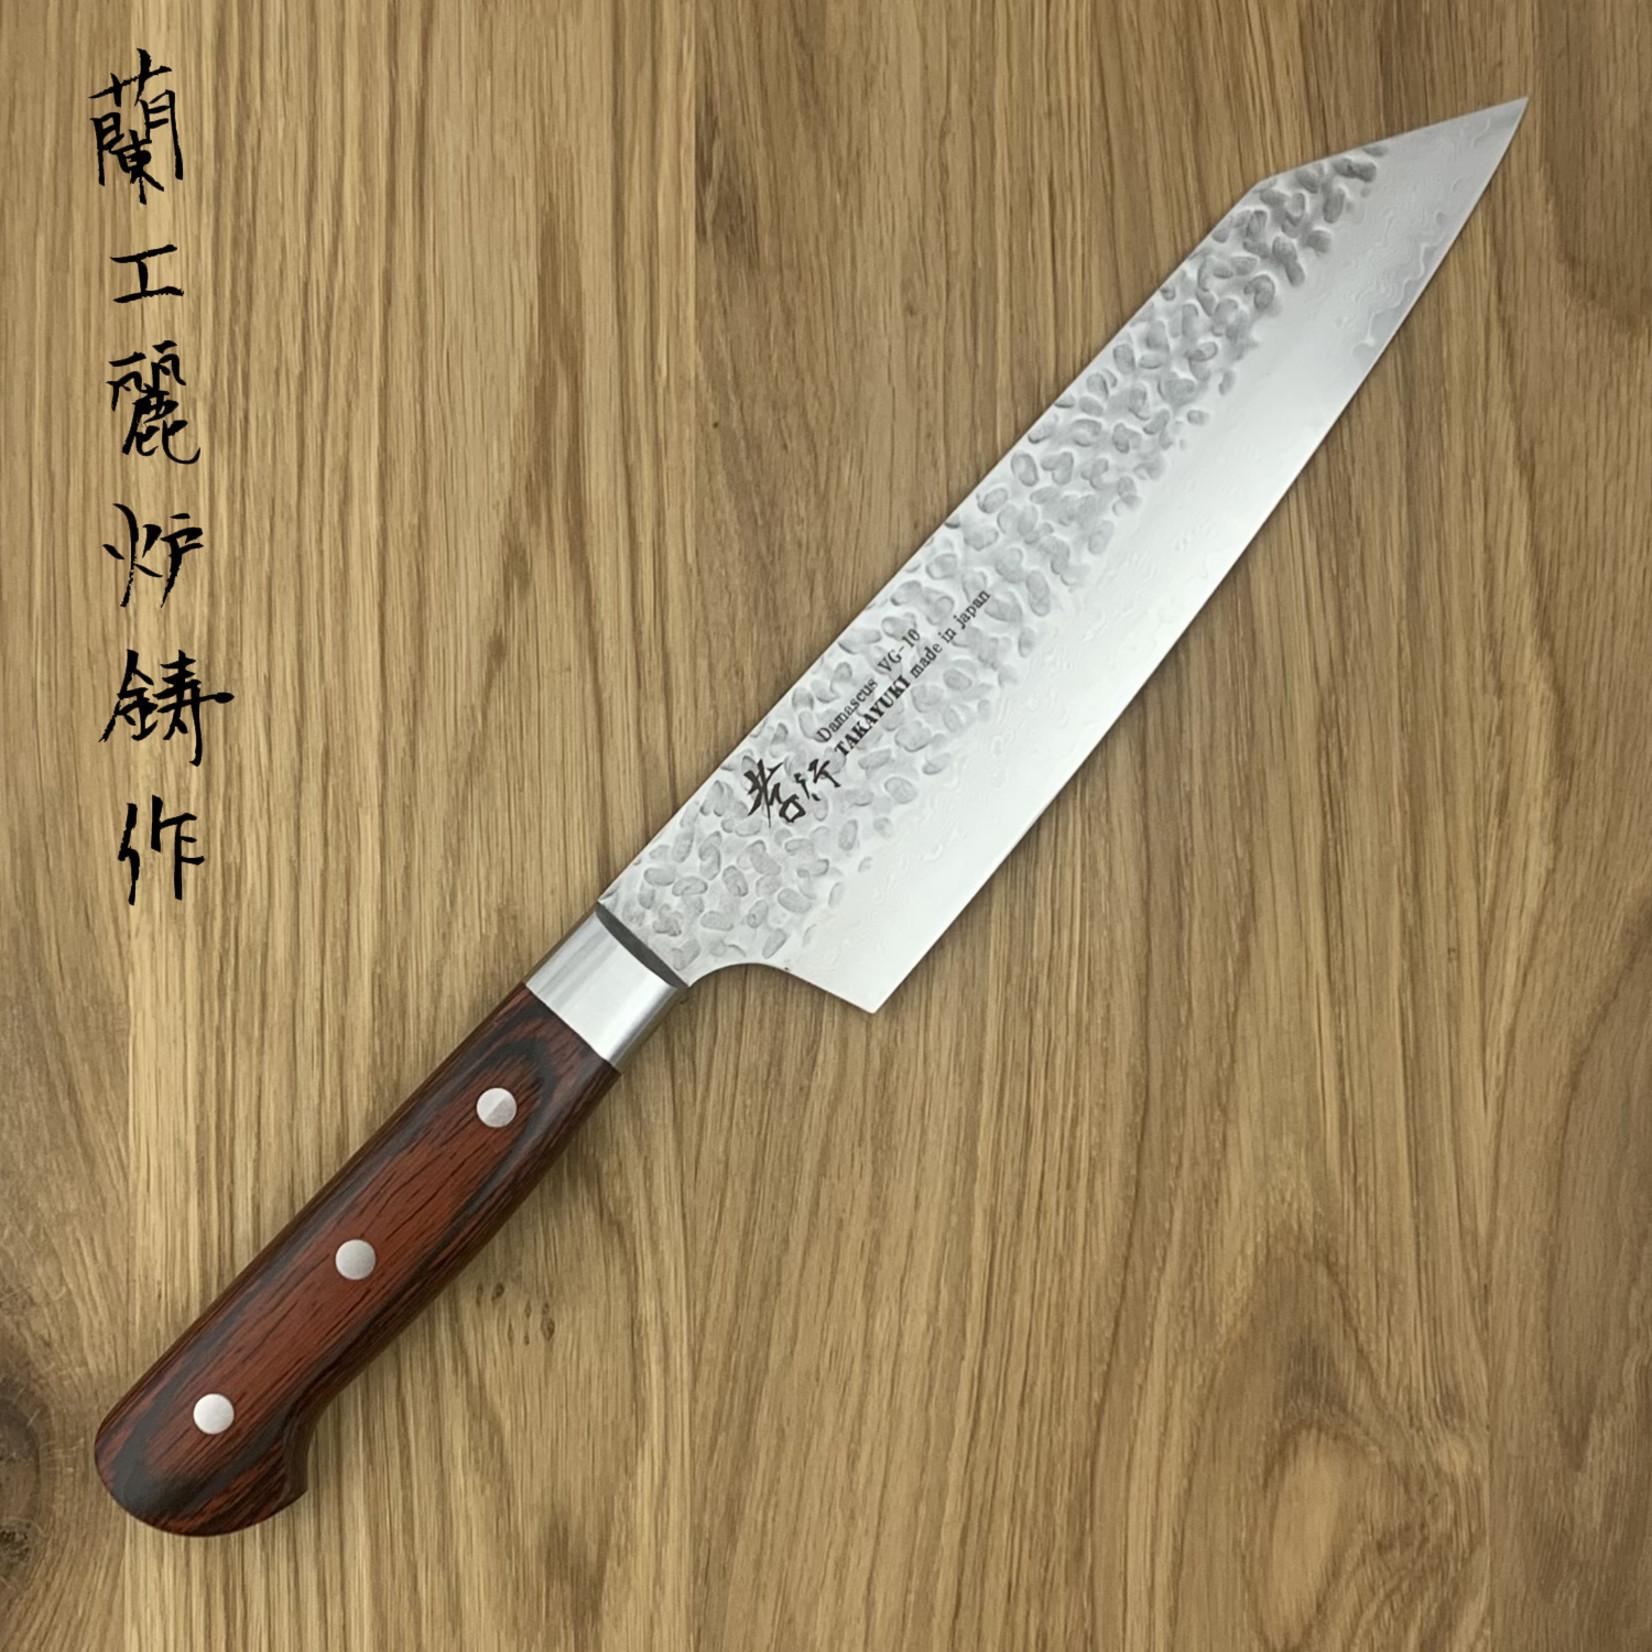 SAKAI TAKAYUKI 33 layers Kengata 190 mm 07400